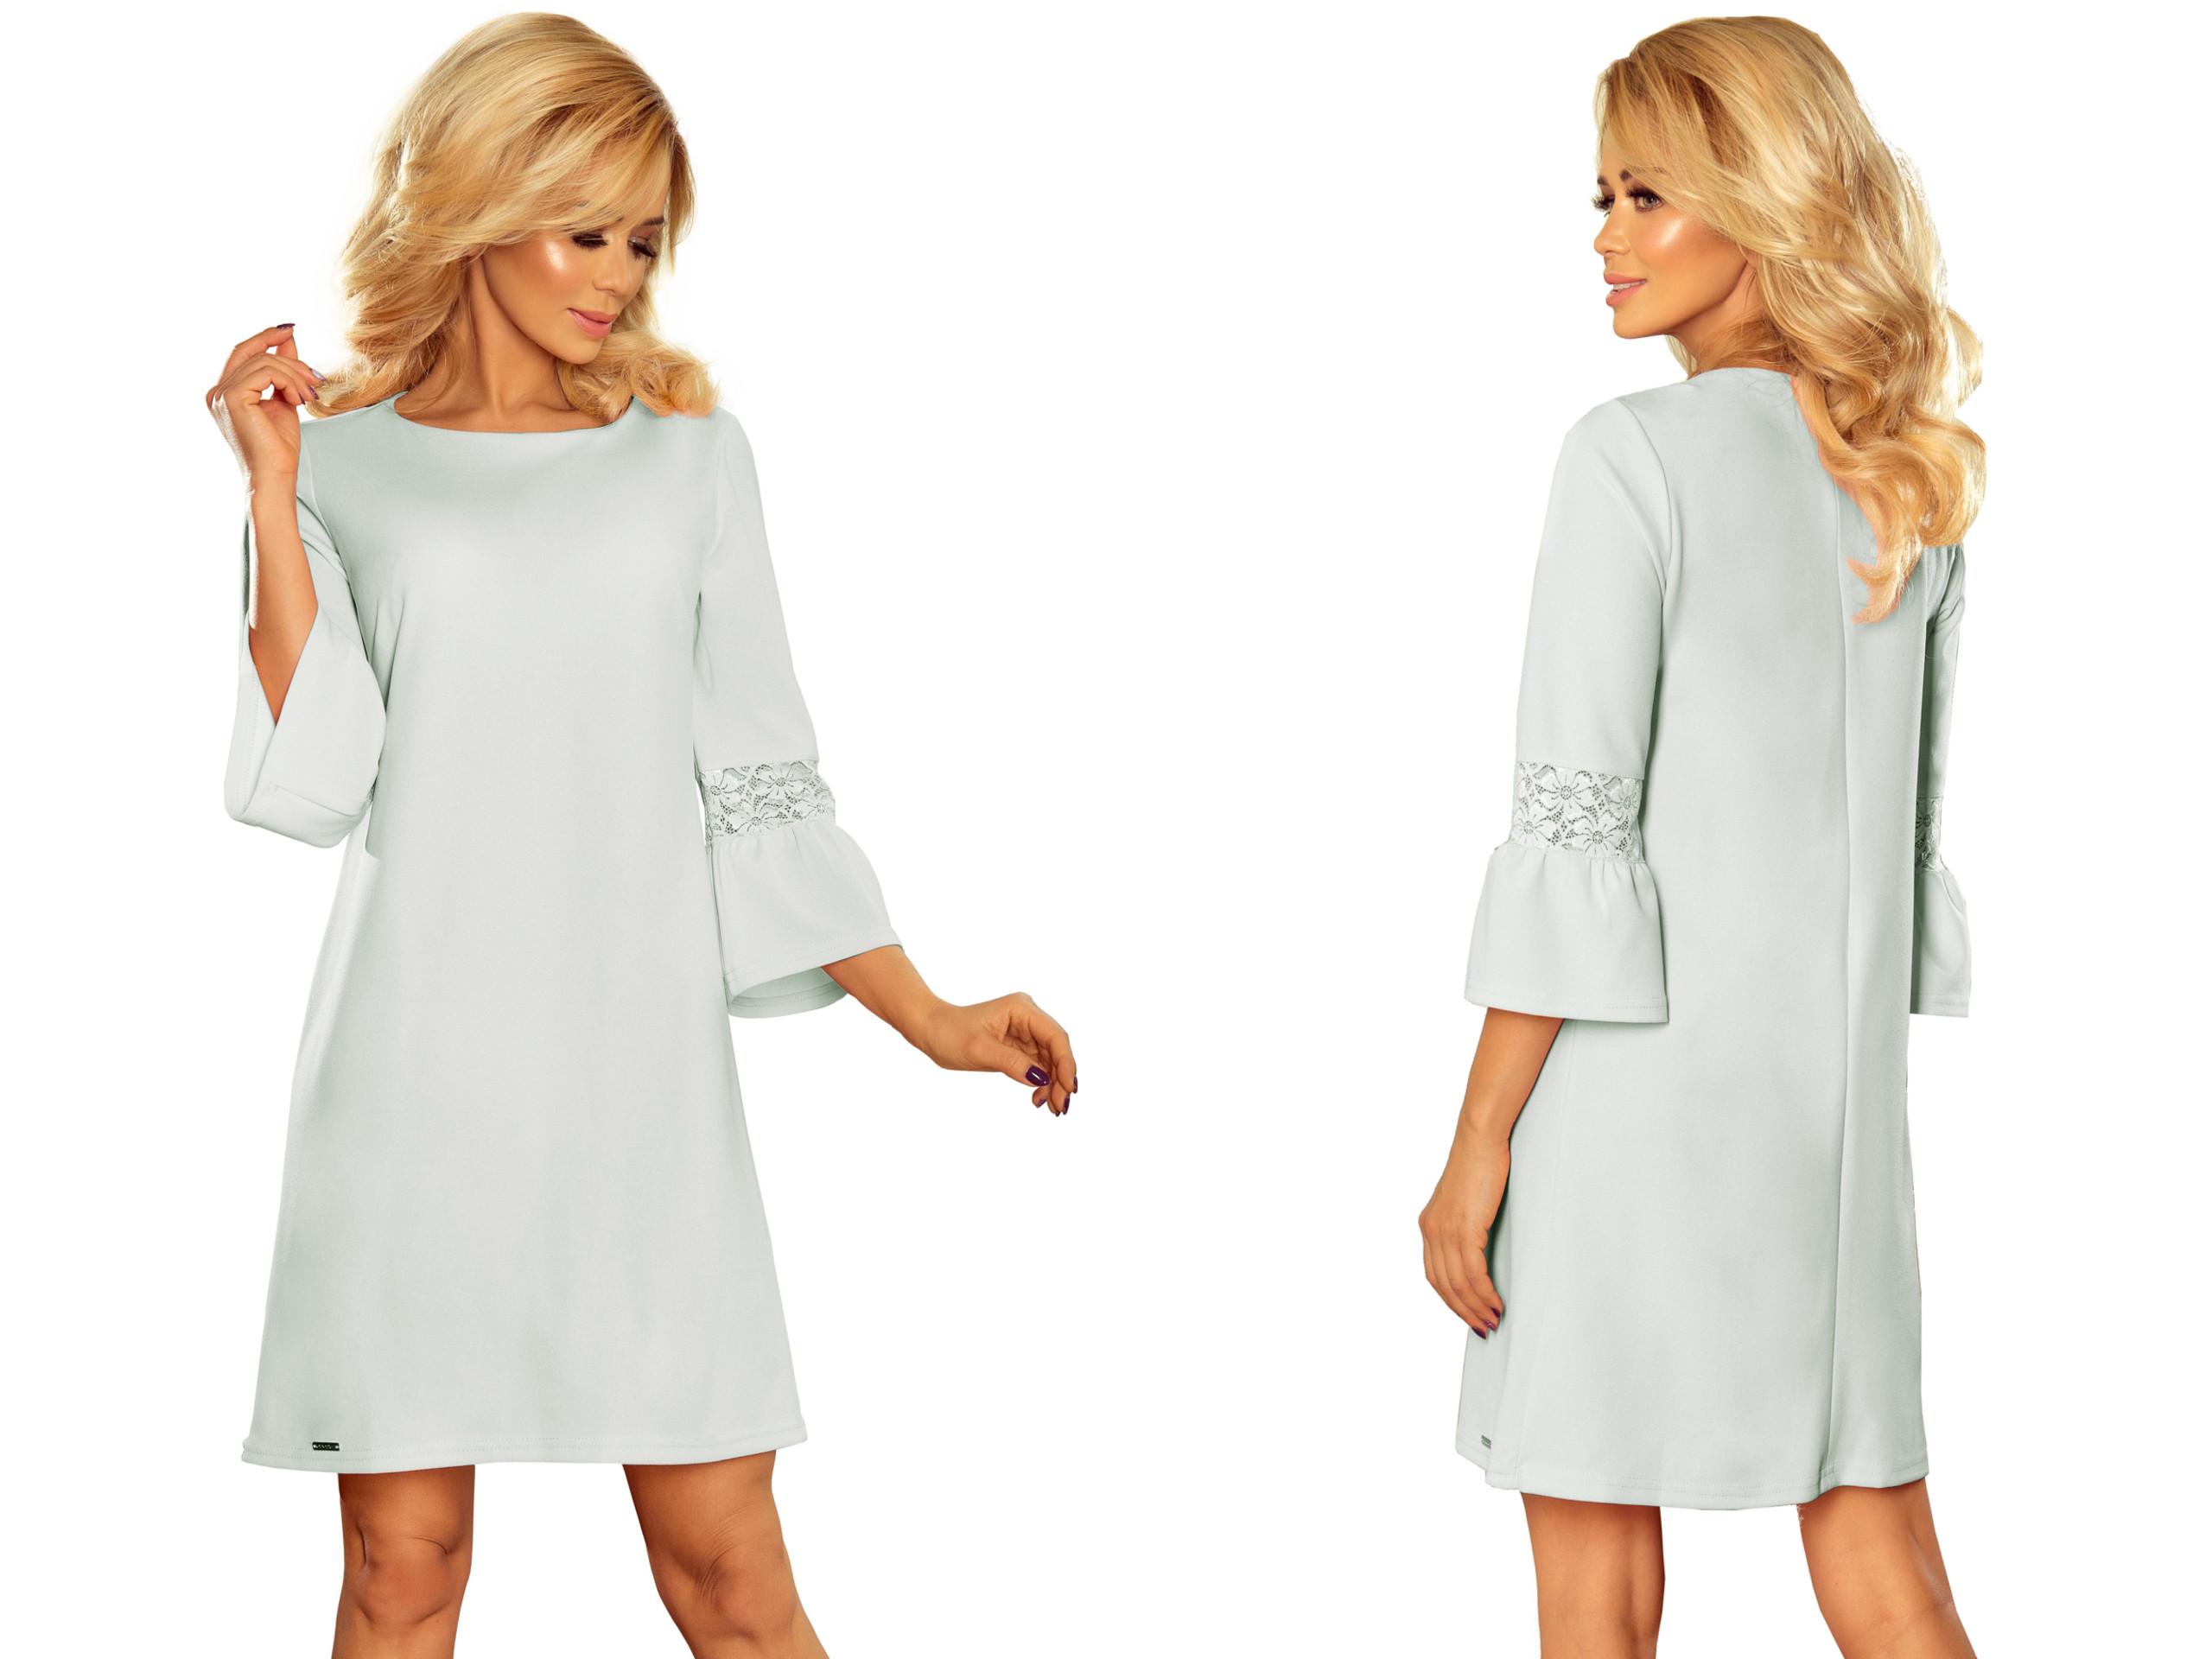 da4b1fe25fc742 Elegancka Sukienka Wizytowa Biznesowa 190-5 S 36 7349059010 - Allegro.pl